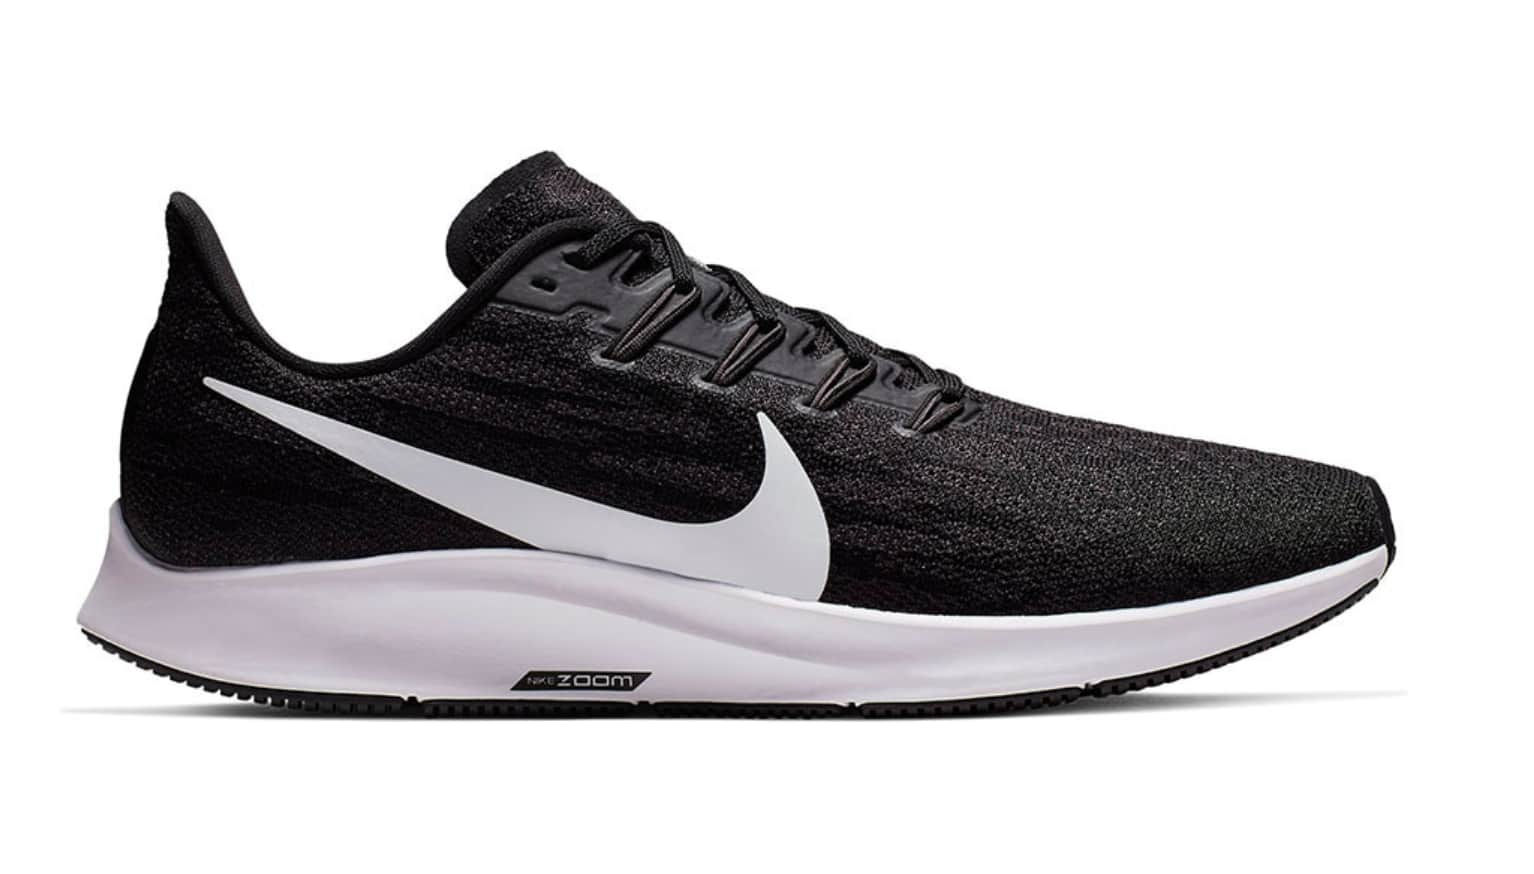 Nike Air Zoom Pegasus 36 Running Shoes (Men's or Women's)